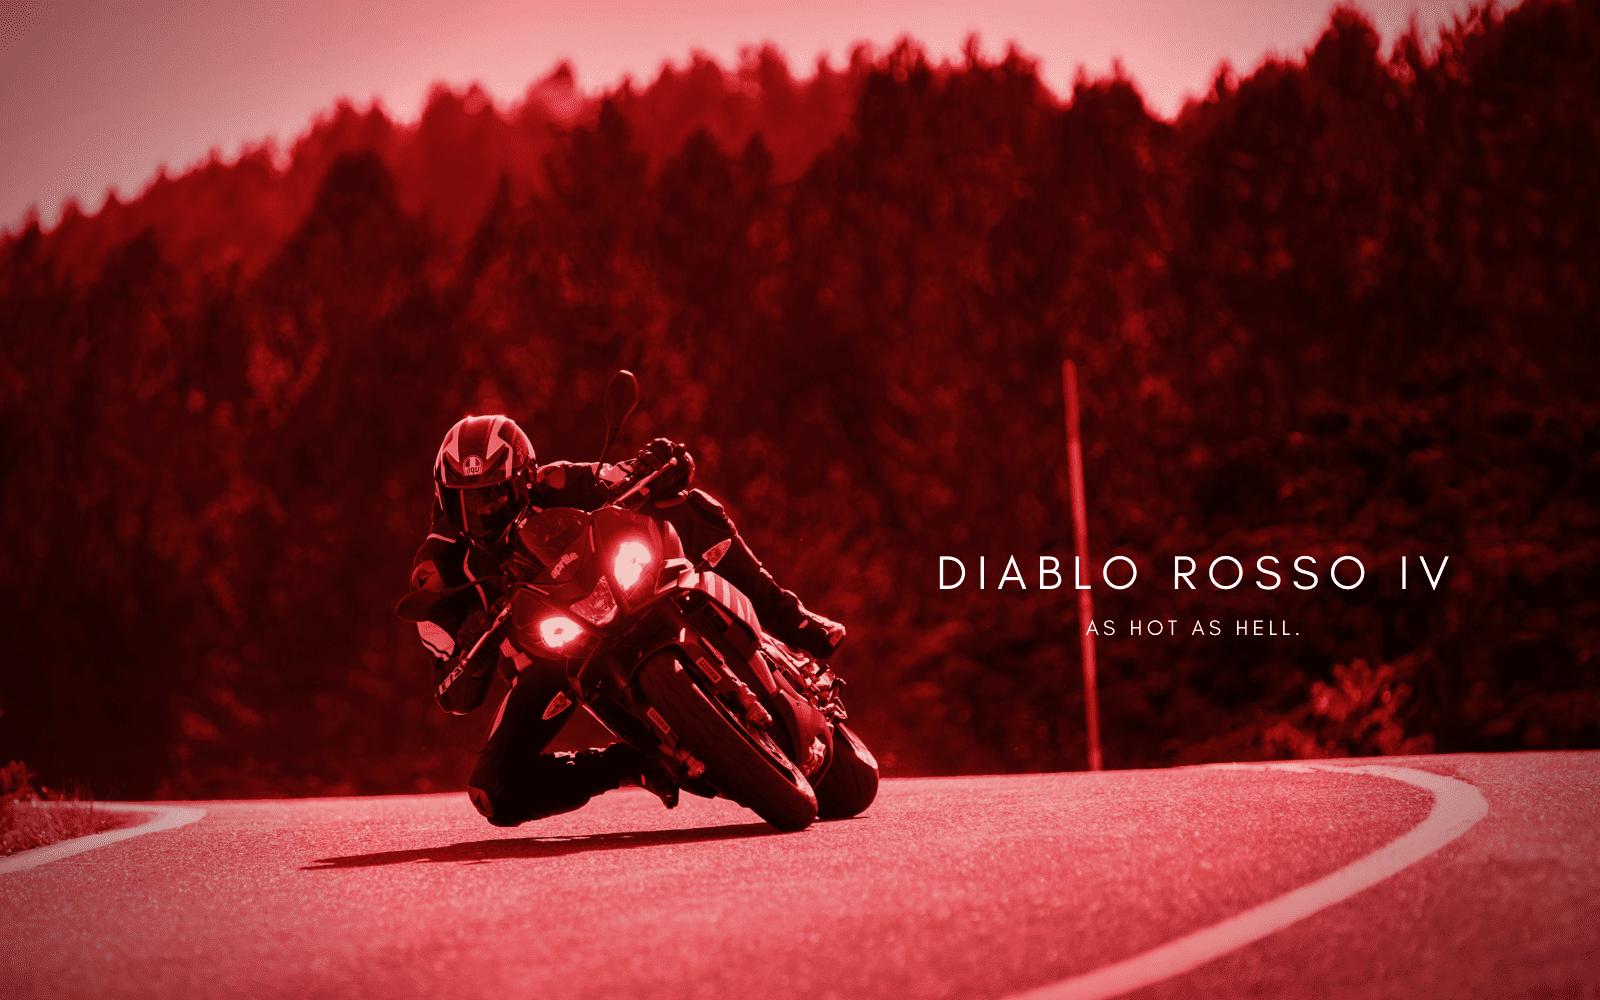 diablo rosso iv (1).png